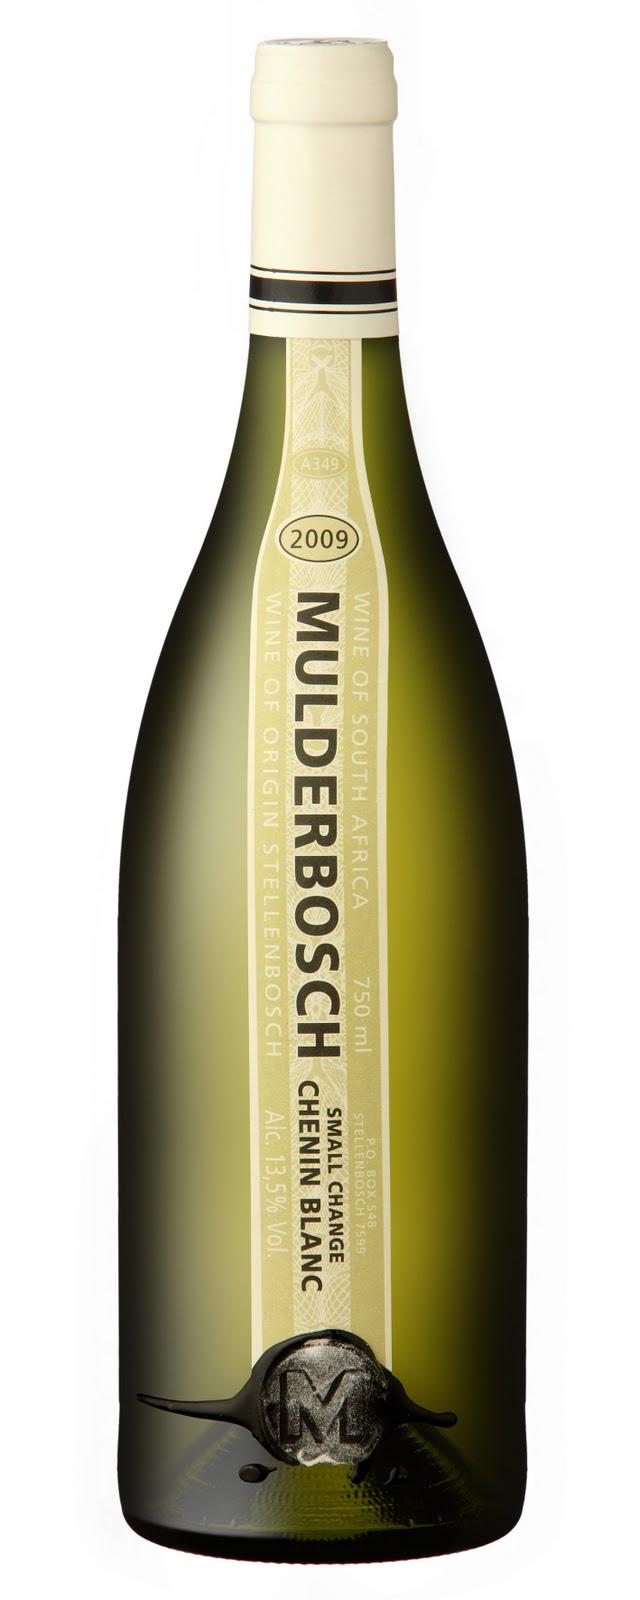 chenin blanc single vineyard sucht de mann frau mulderbosch  Mulderbosch single vineyard chenin blanc. Mulderbosch single vineyard chenin blanc.